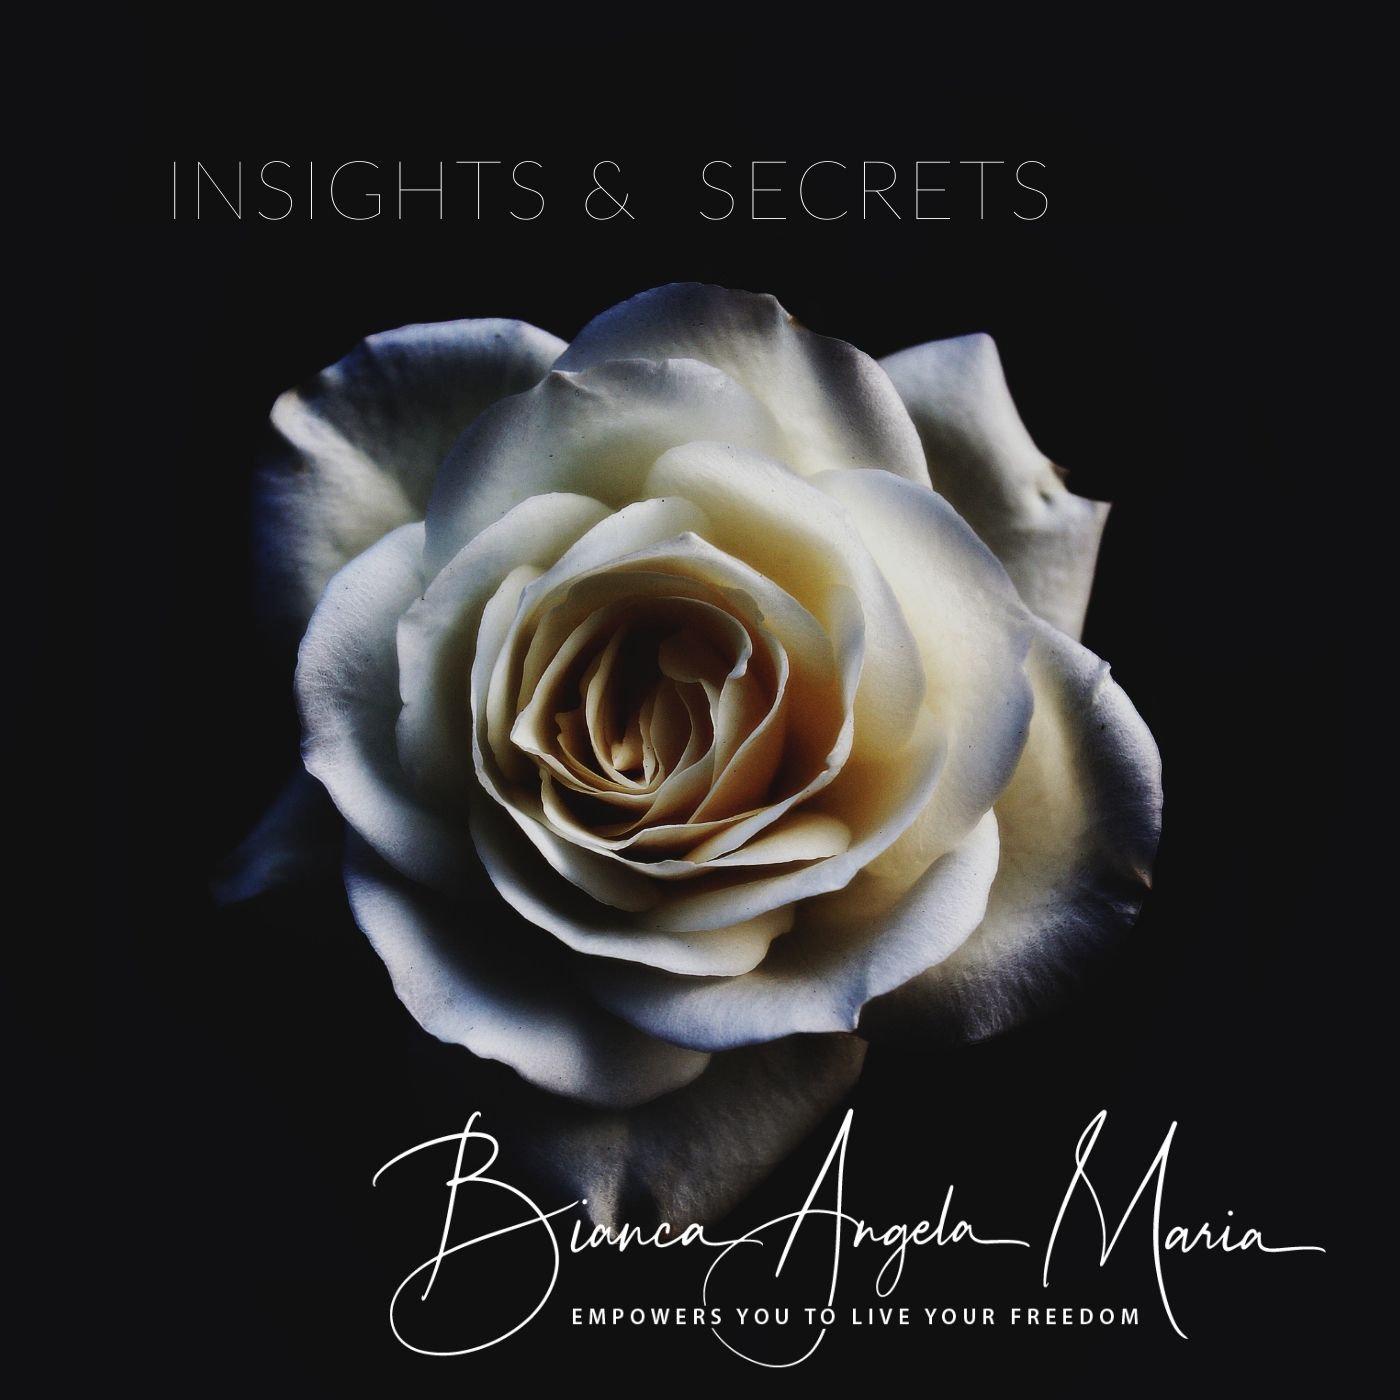 INSIGHTS & SECRETS  - PRE CALL